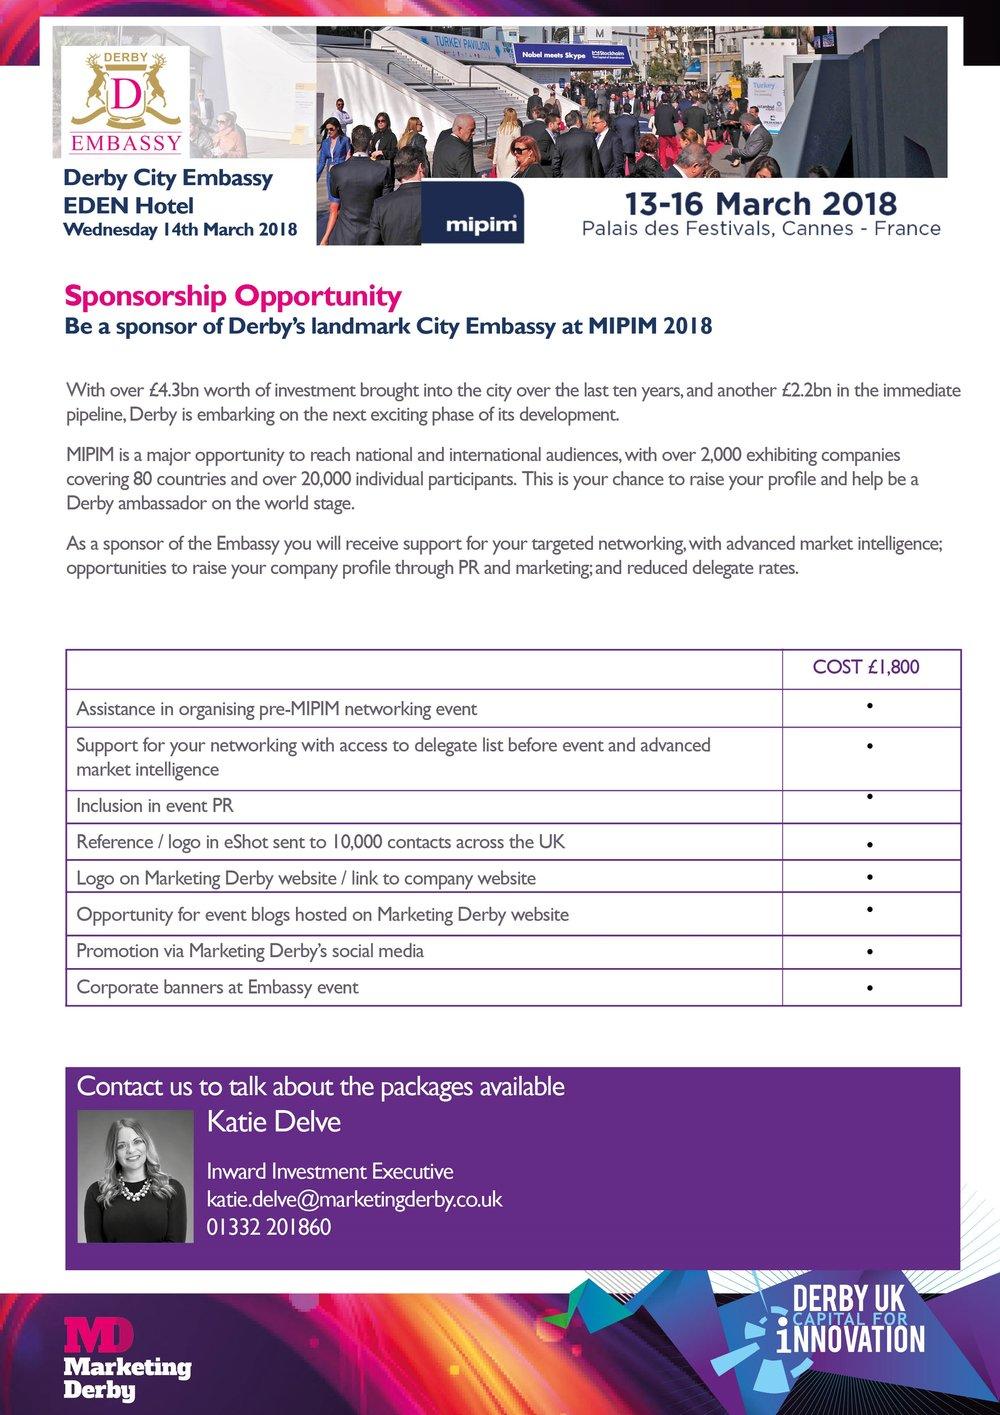 MIPIM 2018 Sponsorship2.jpg